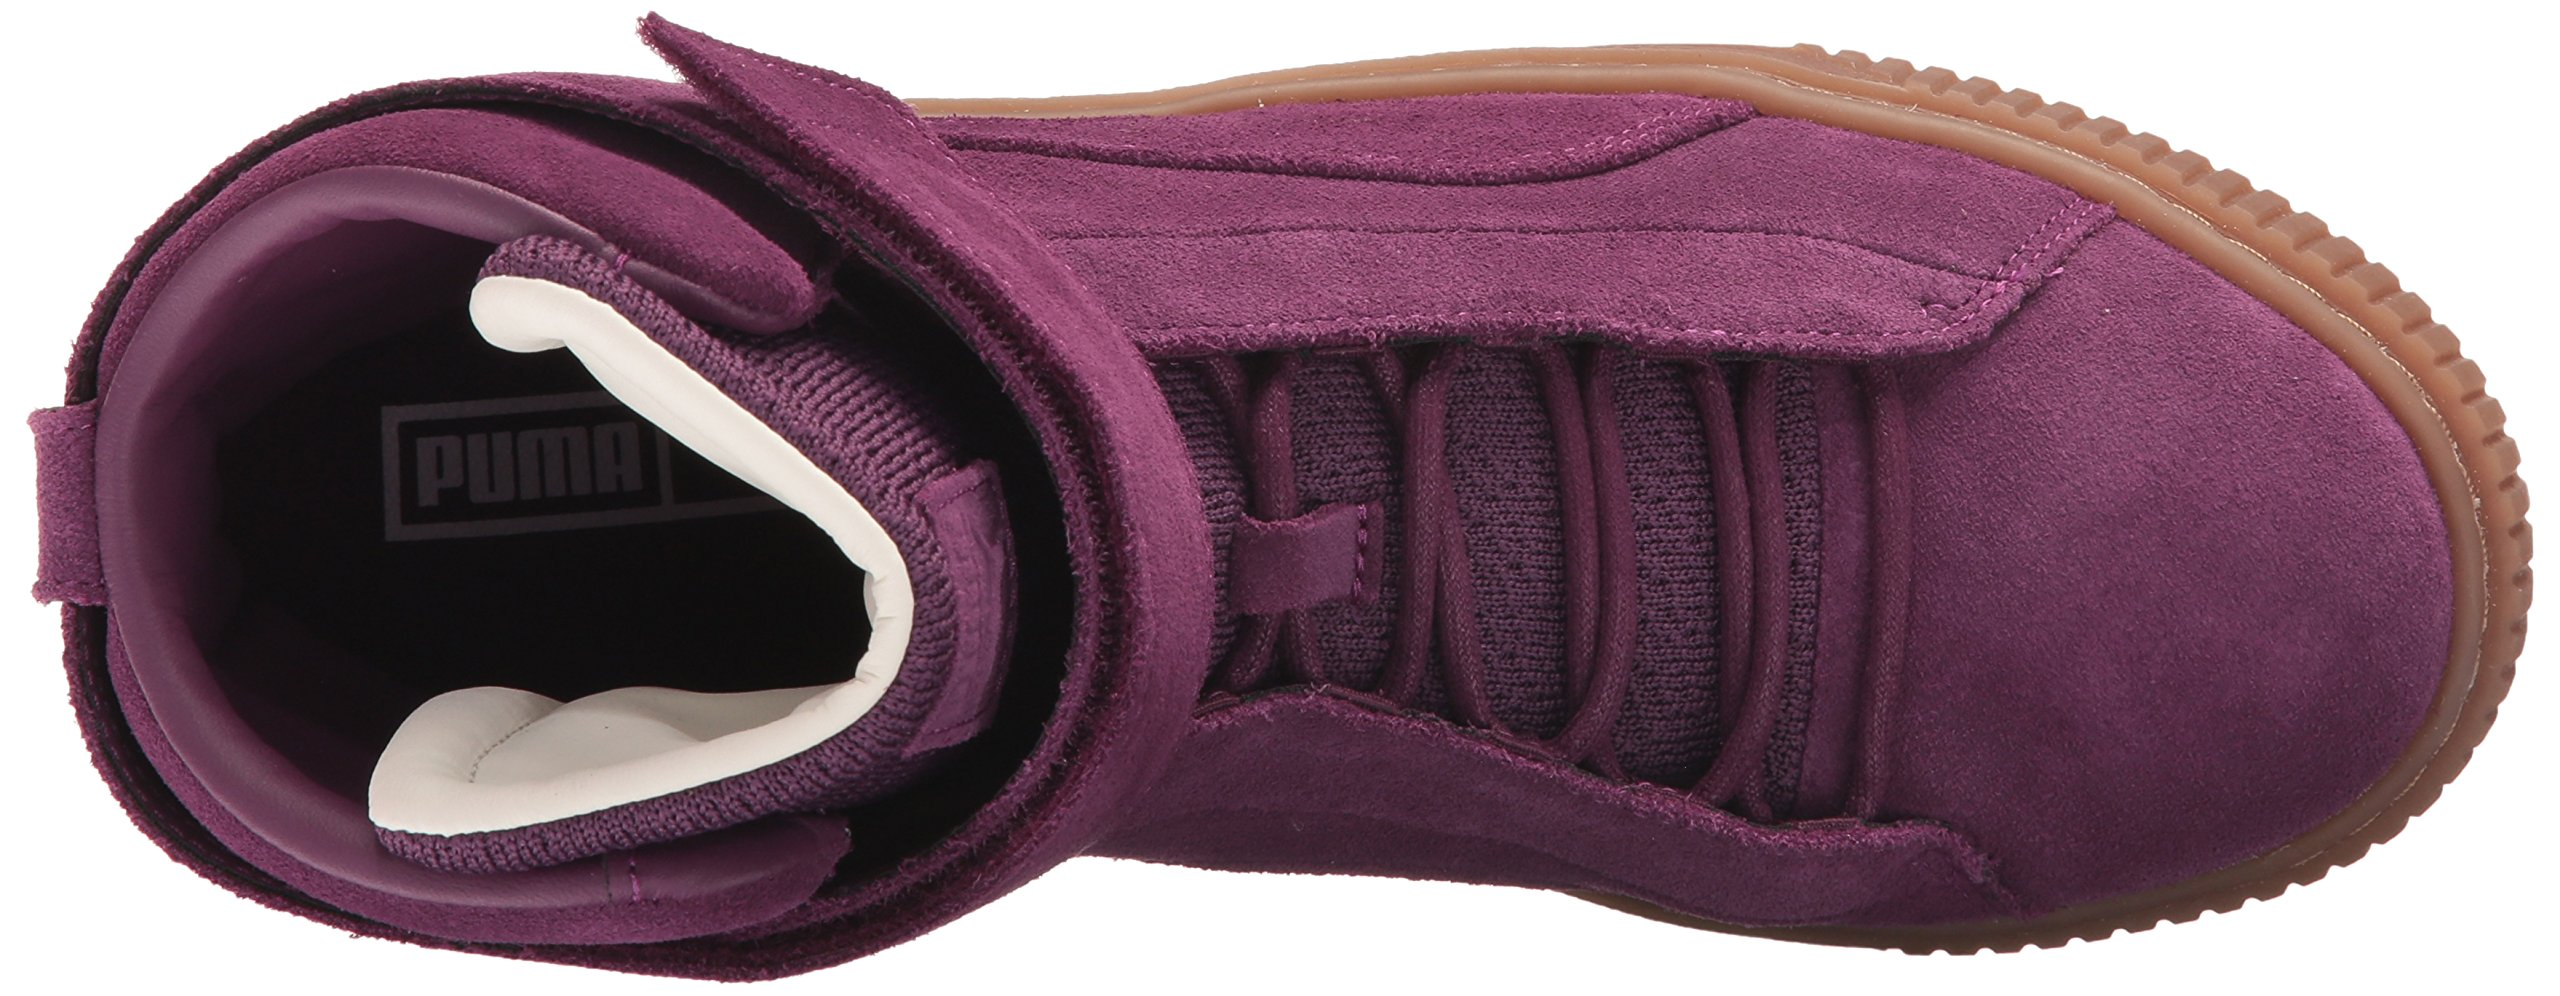 PUMA Women's Platform Mid OW Wn, Dark Purple-Dark Purple, 8.5 M US by PUMA (Image #8)